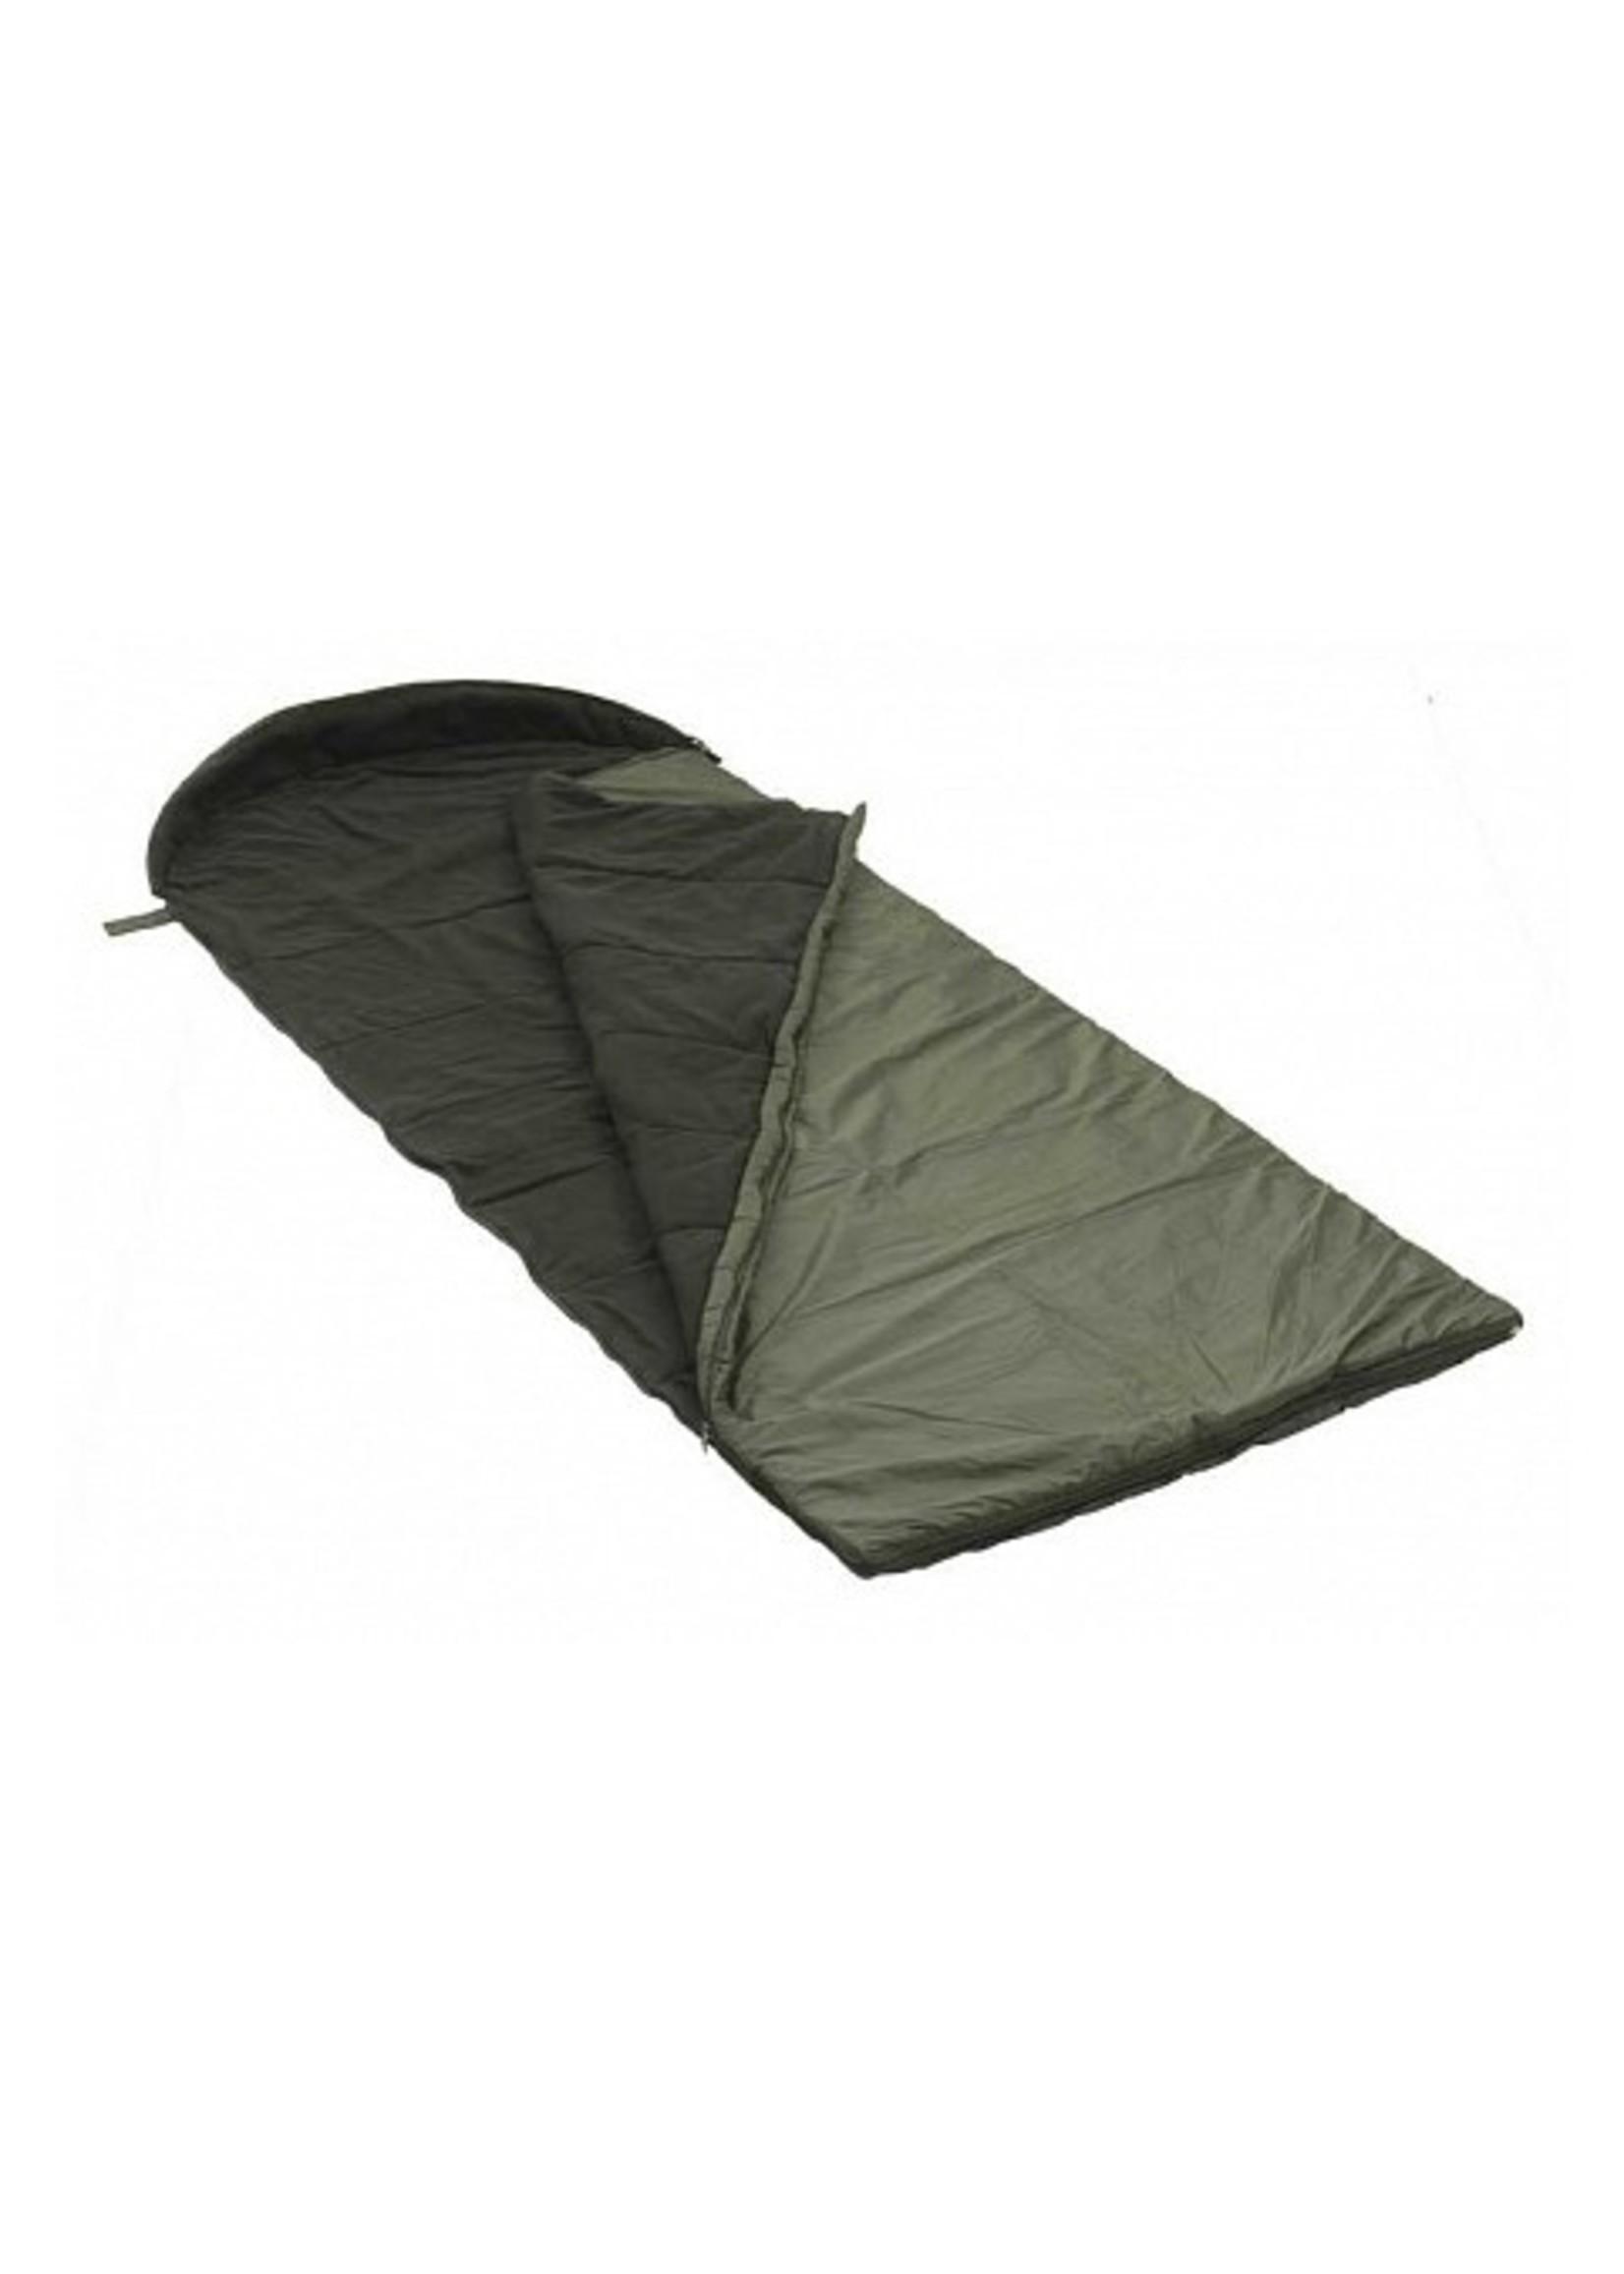 mivardi Sleeping bag easy